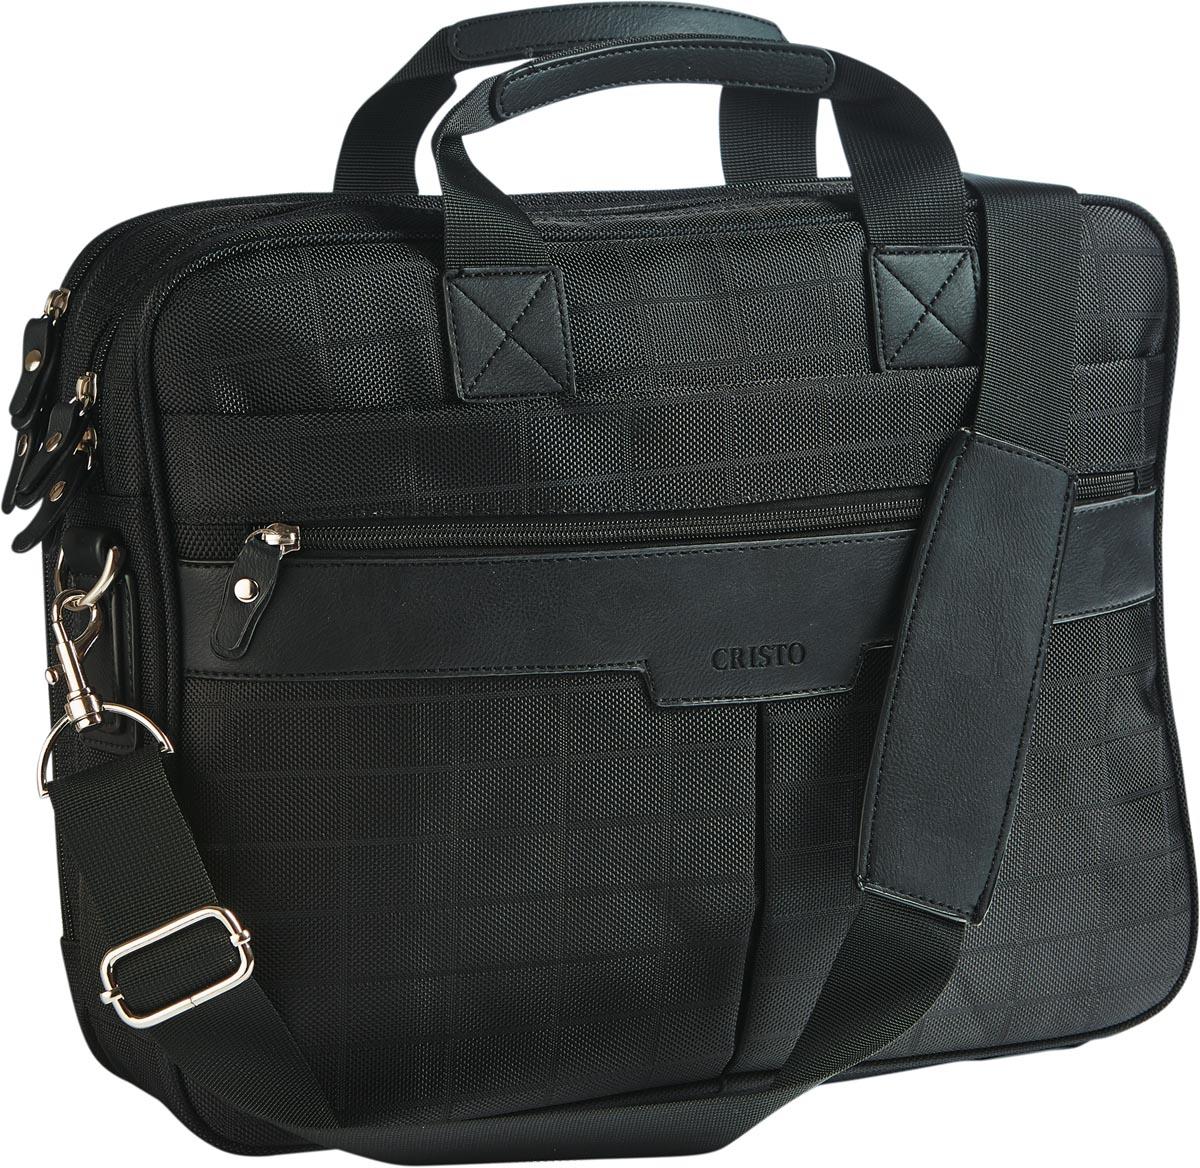 Cristo Portable laptoptas voor 15 inch laptops, zwart